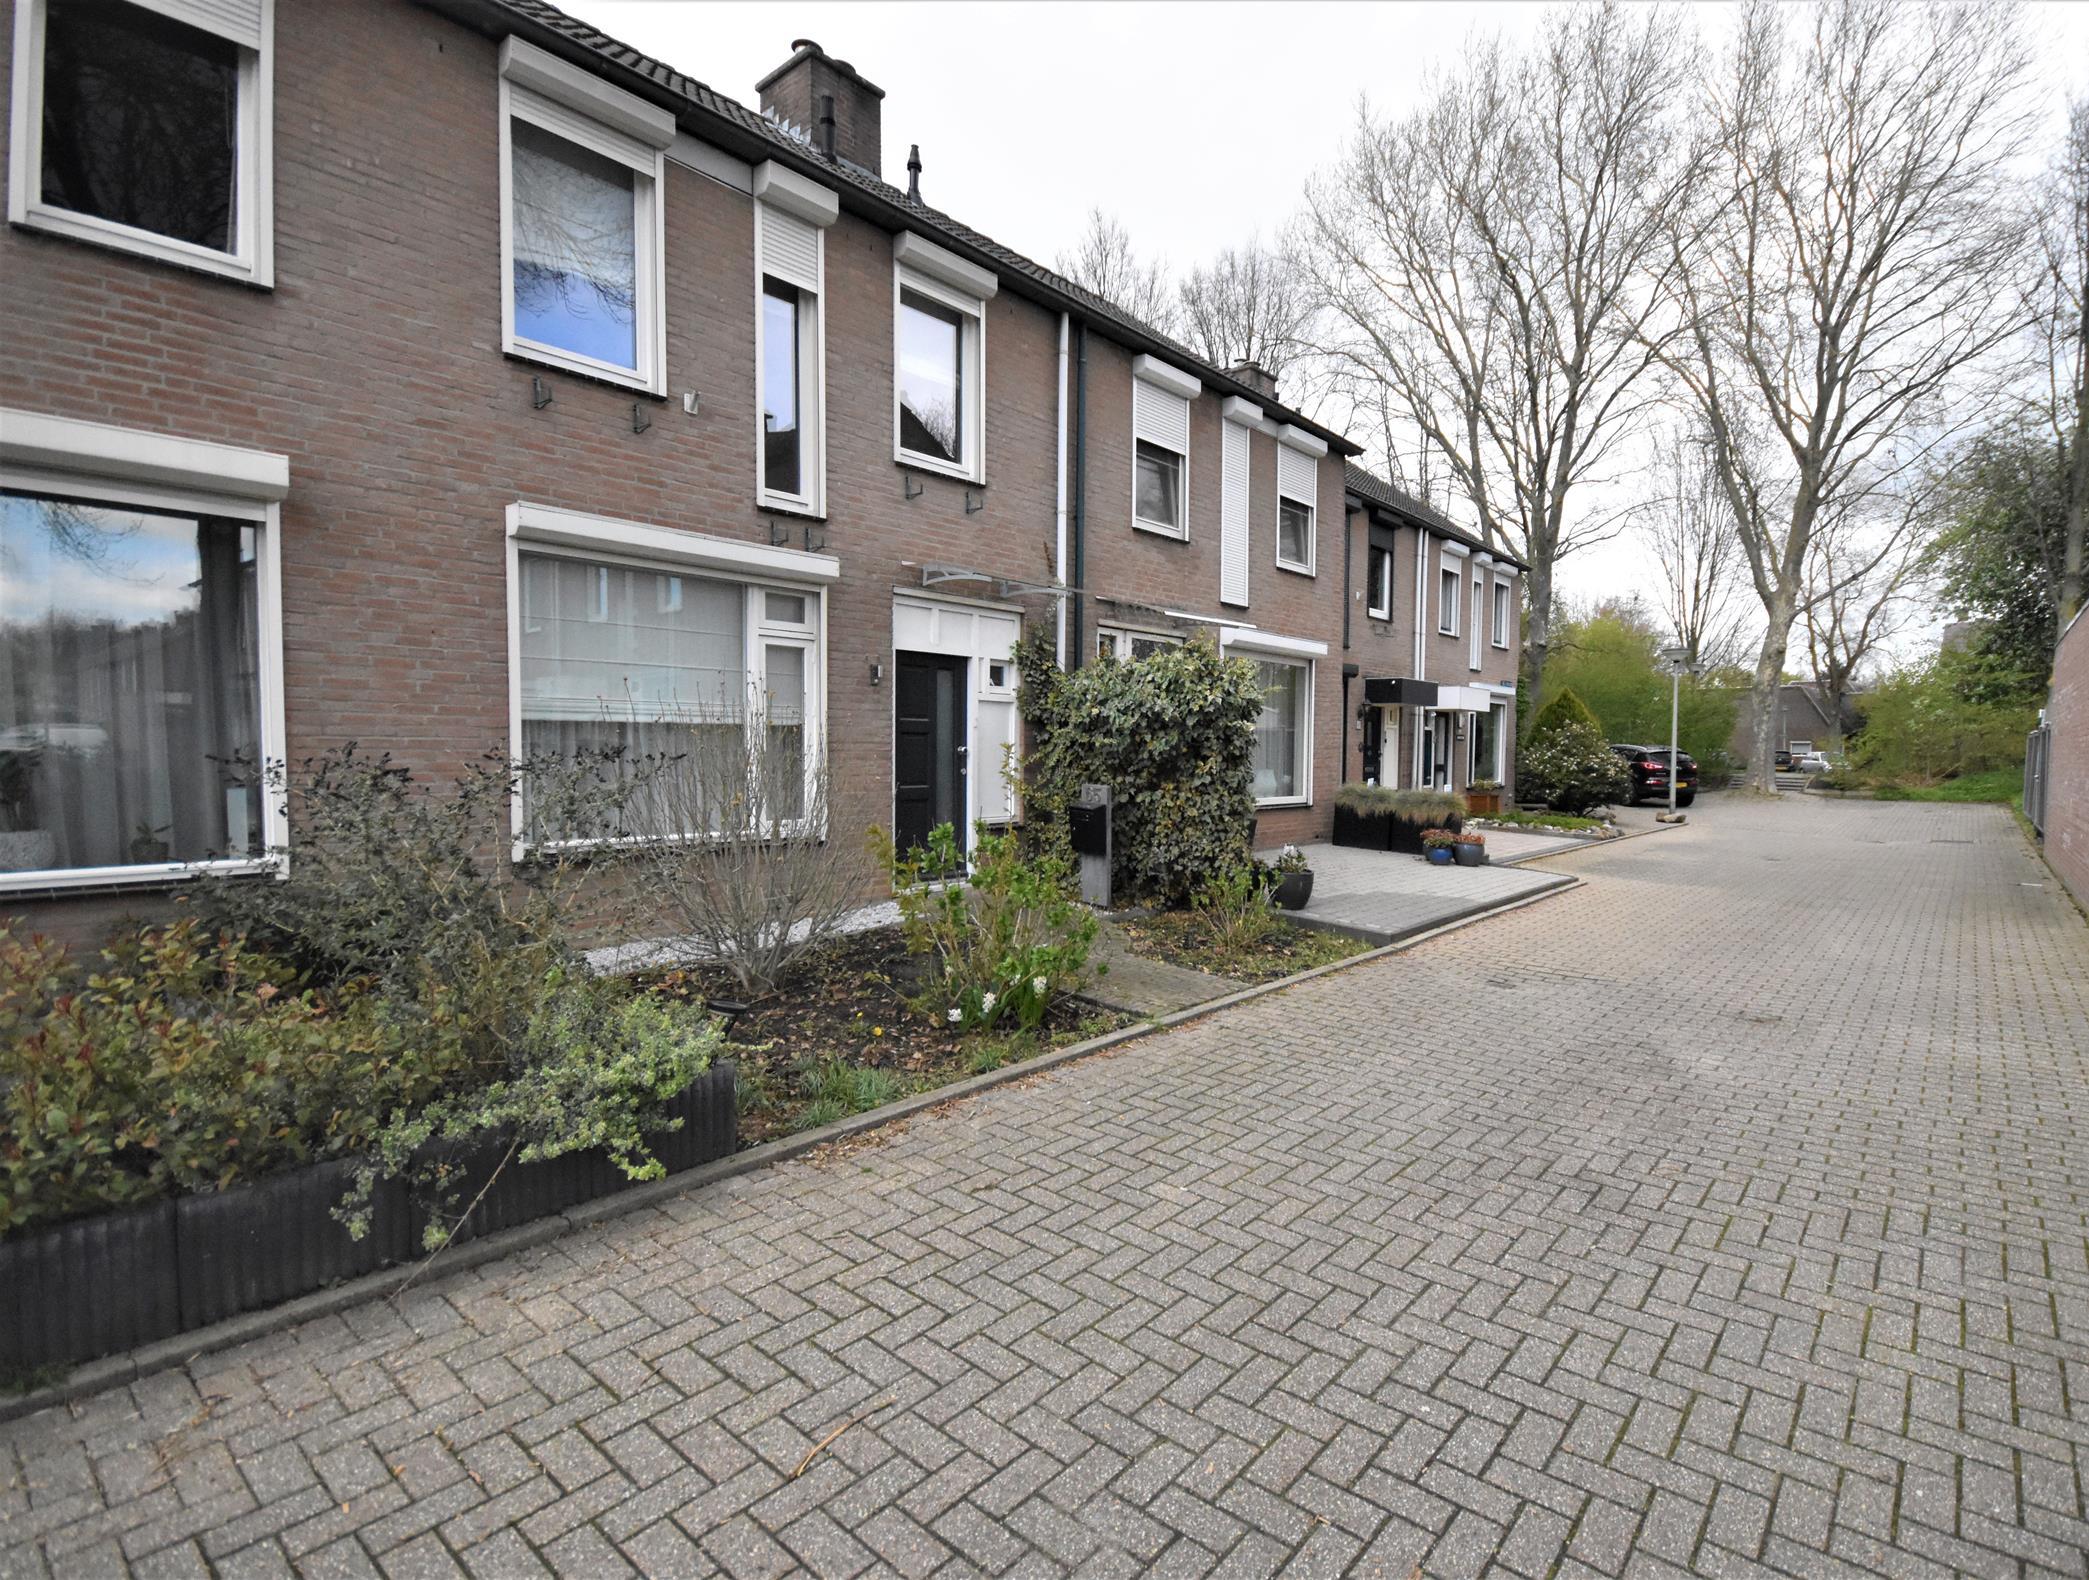 Reyckenborg, Maastricht